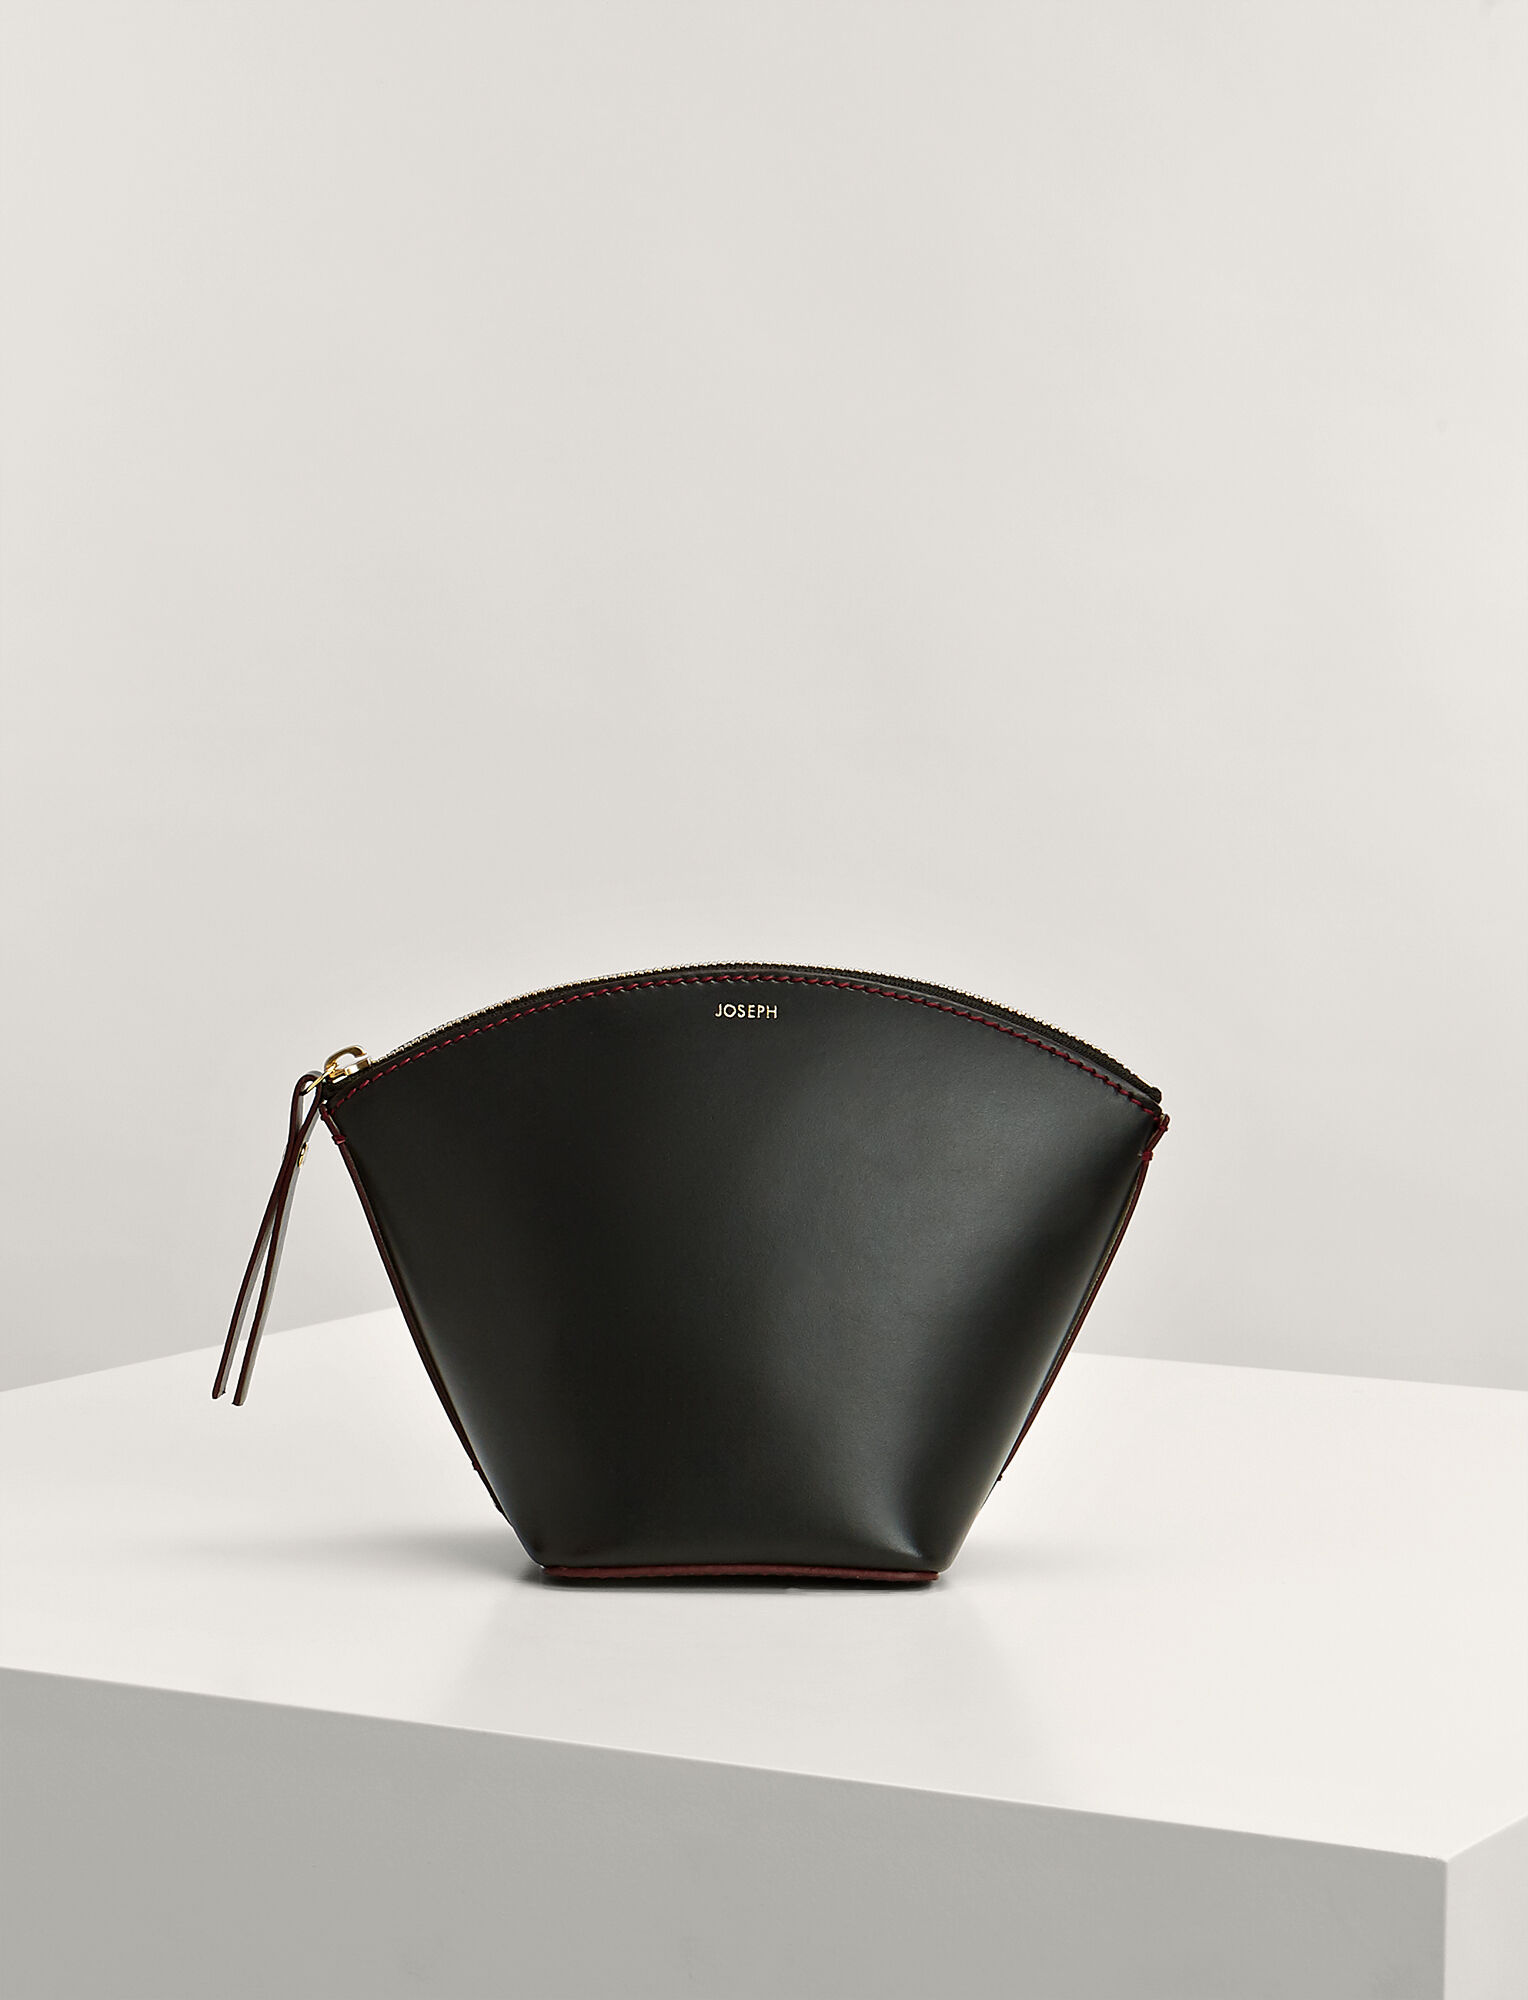 Bag Calf Clutch Leather In Taco BlackJoseph JlFKT1c